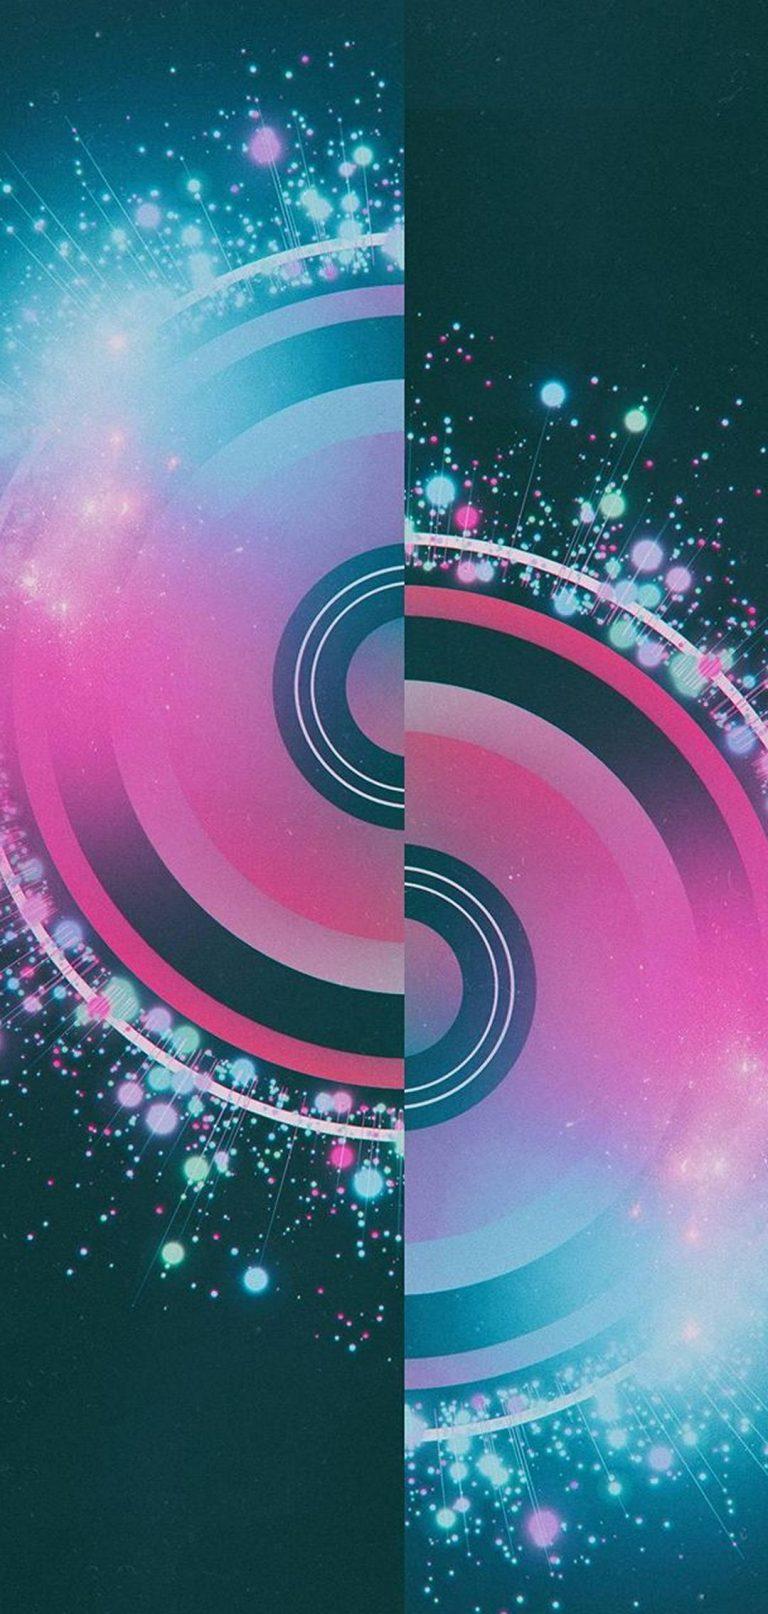 Half Circles Design Abstract 1080x2270 768x1614